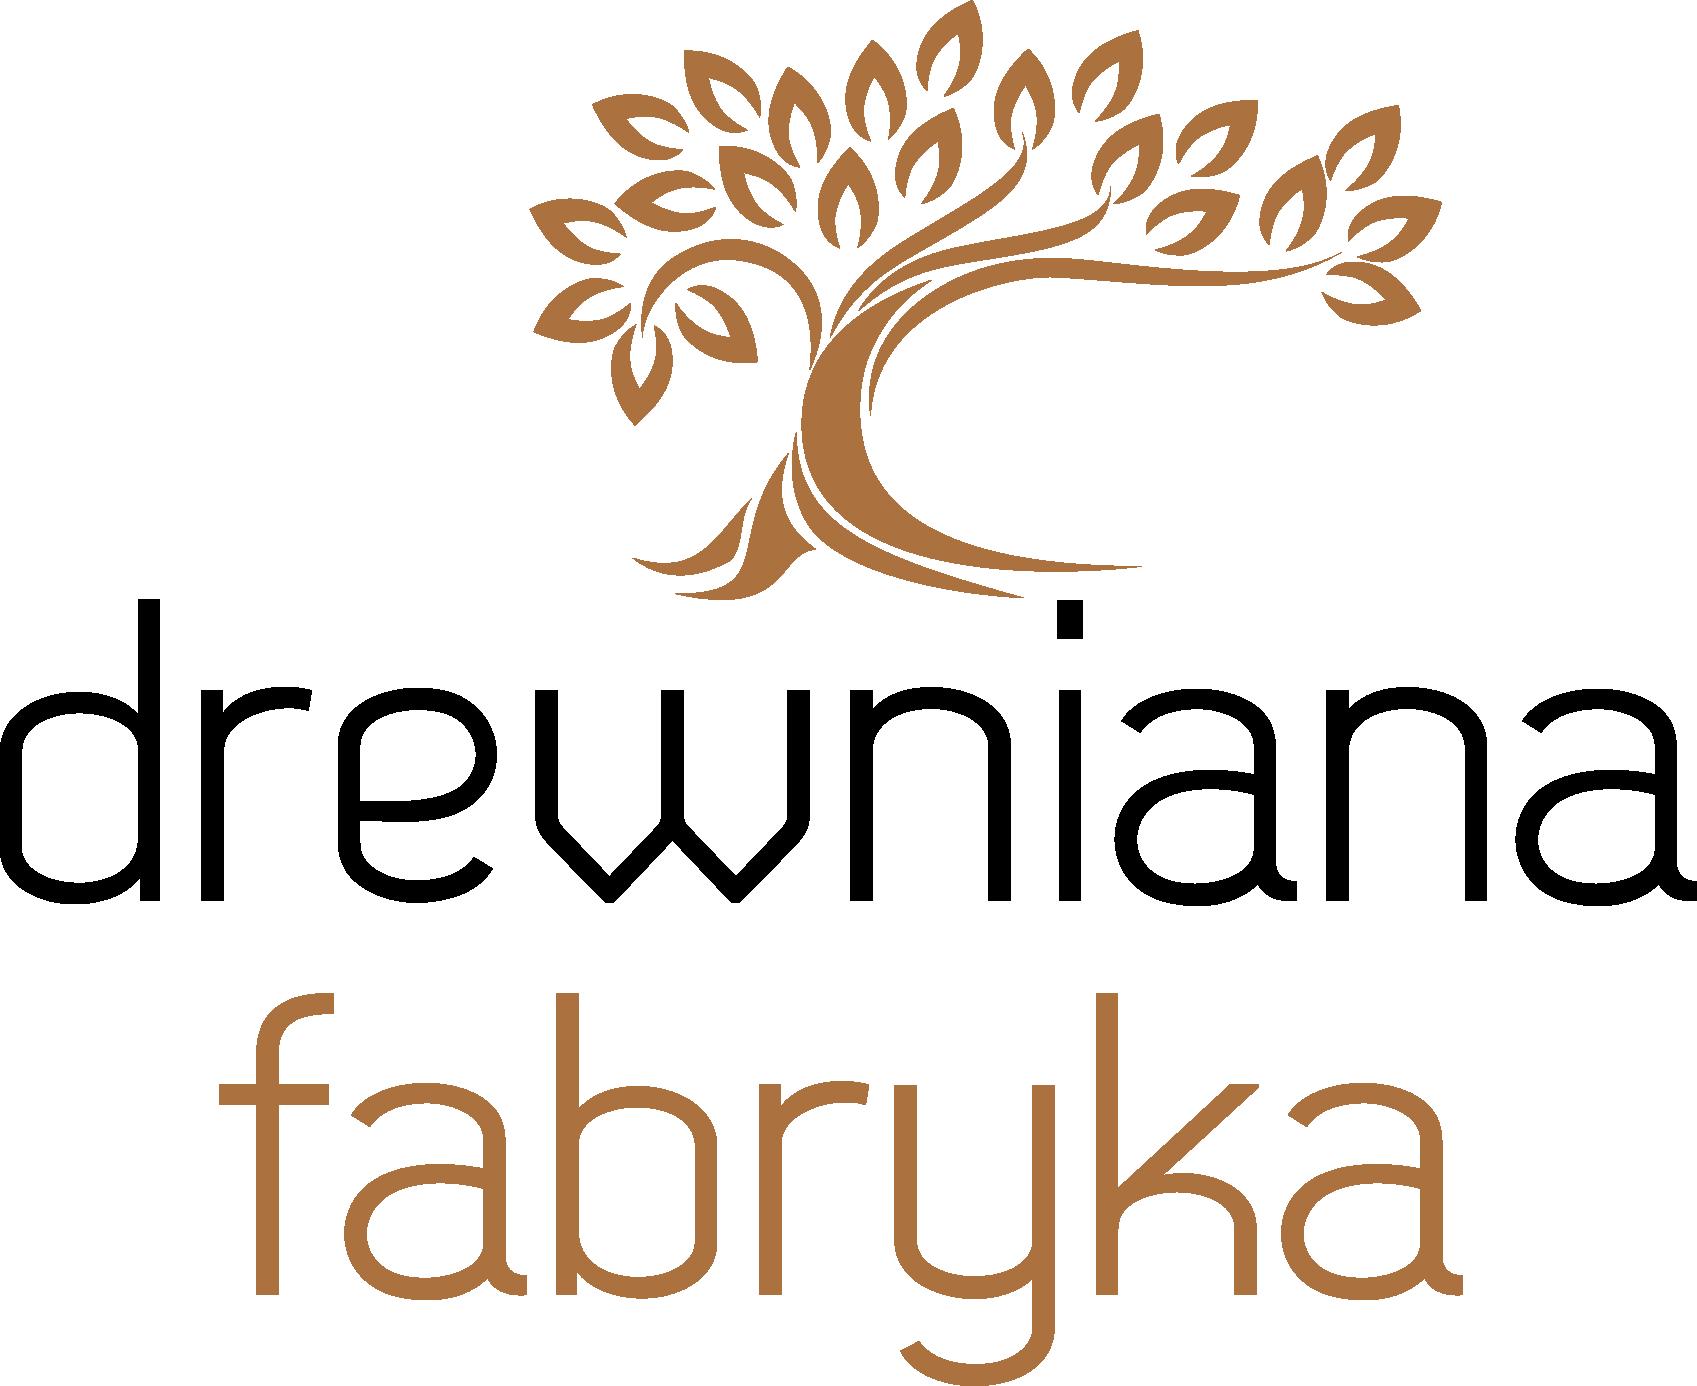 Drewnianafabryka.pl